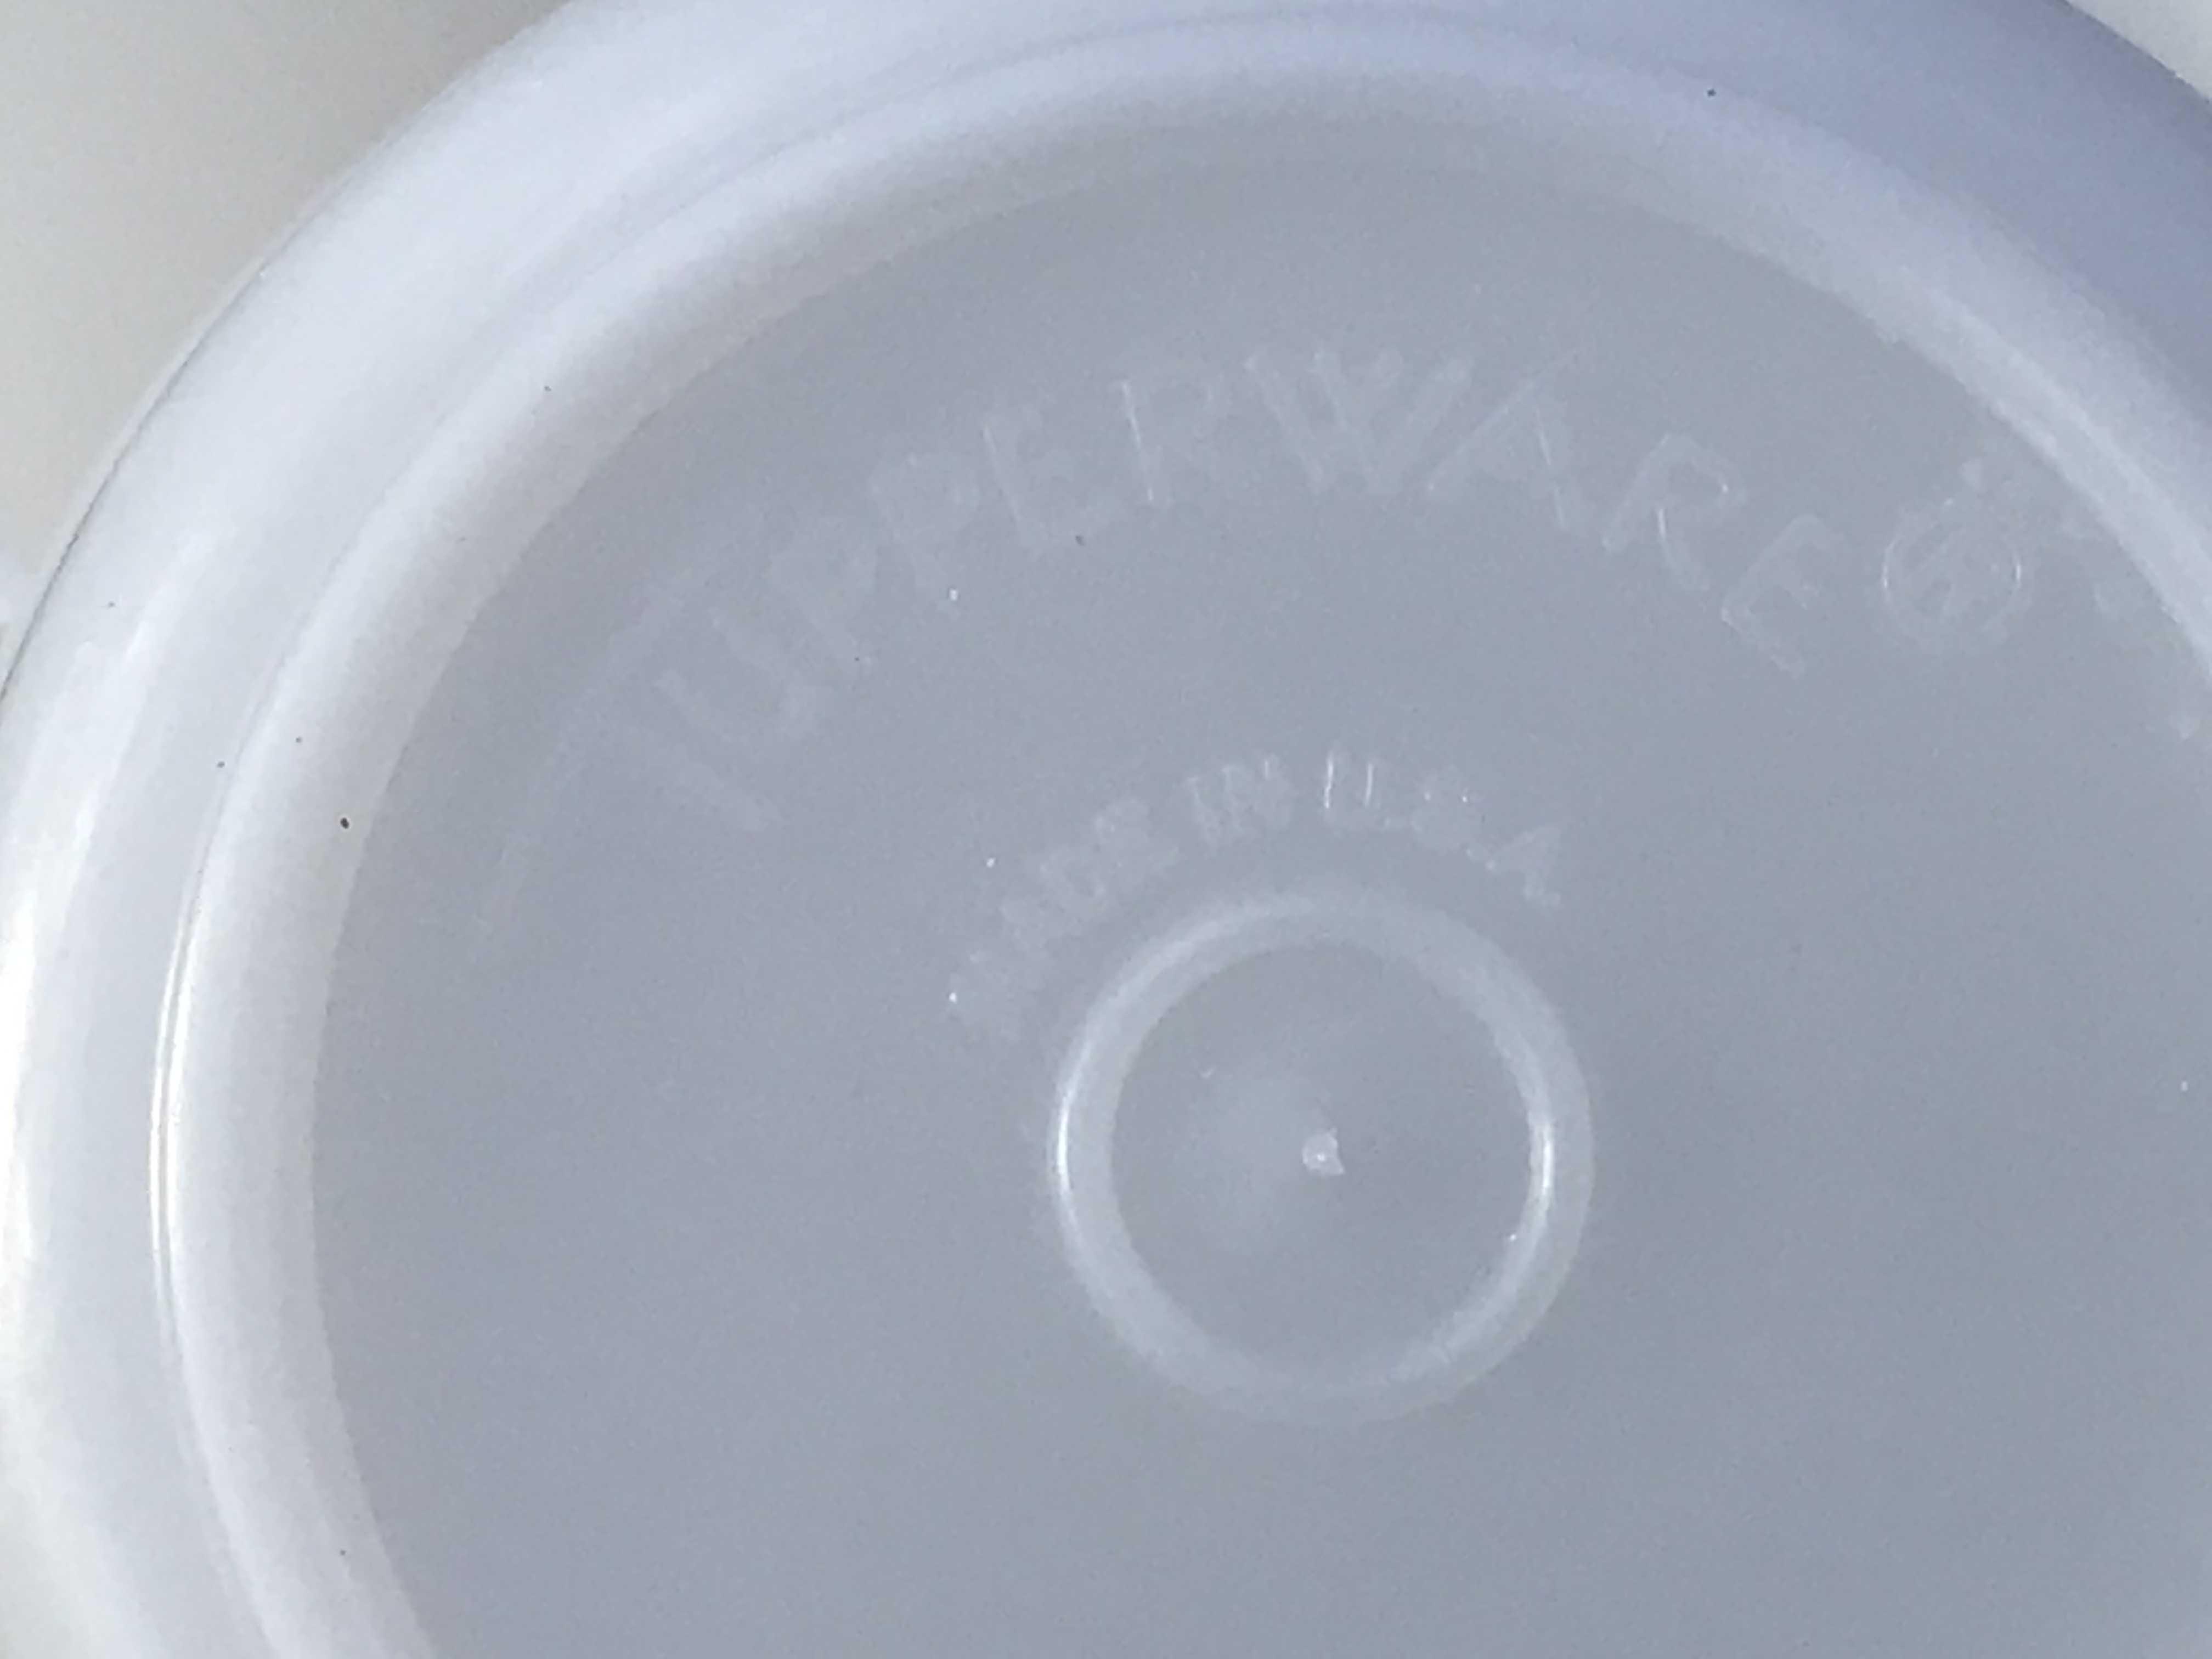 White Tupperware Vintage Measuring Cups: Non-detect for Lead, Mercury, Cadmium and Arsenic.